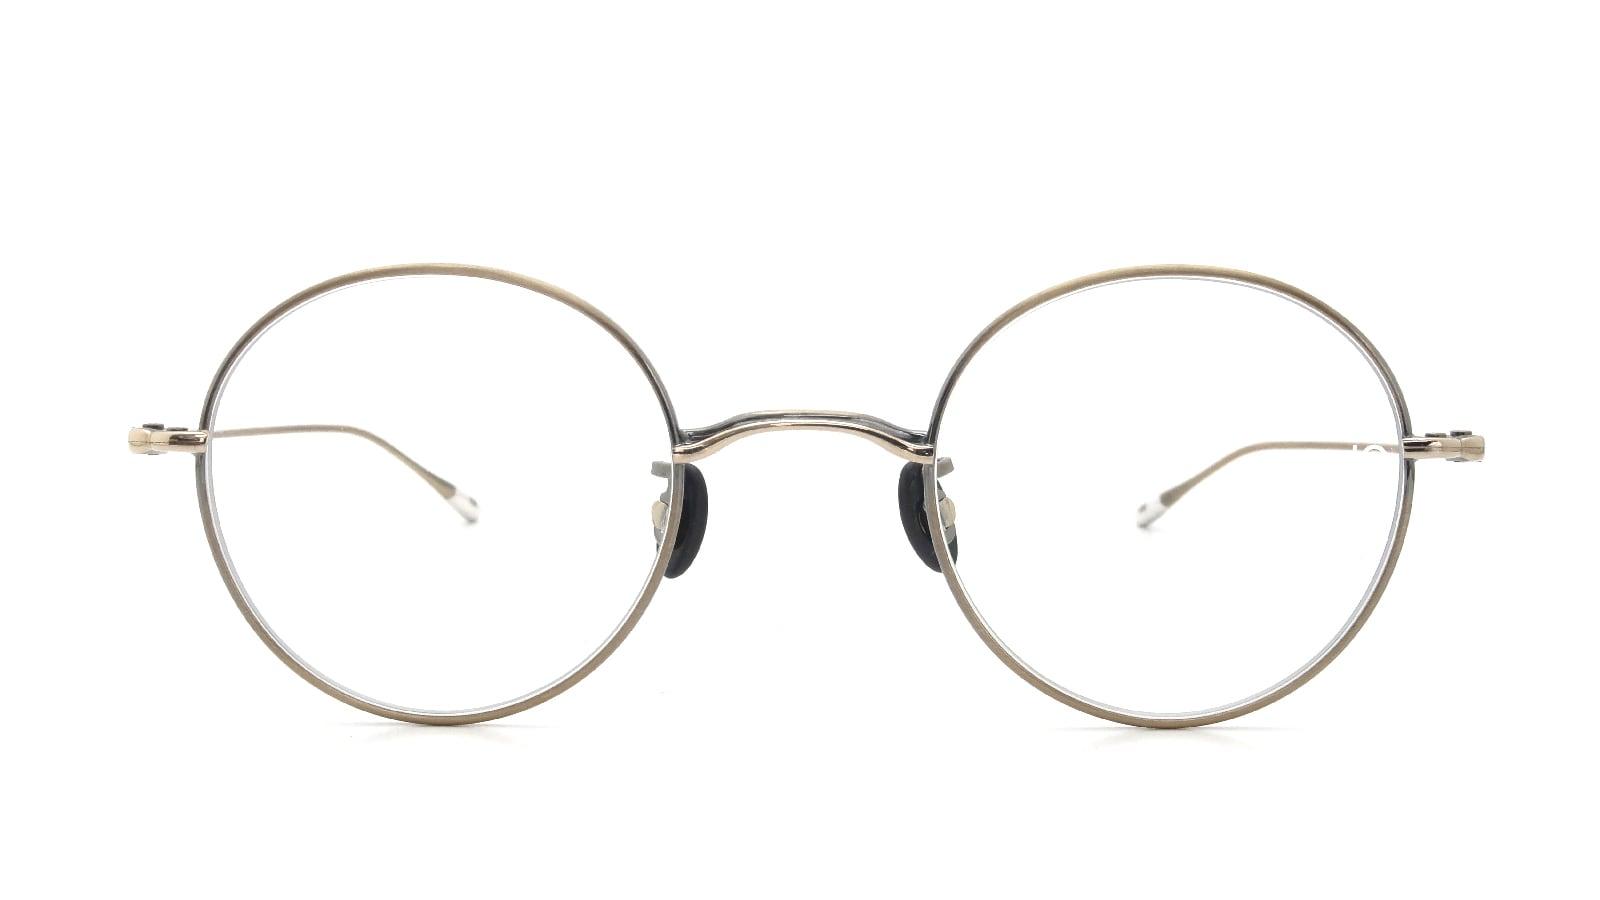 10 eyevan NO.5 44 4S-CL OldGold  正面詳細